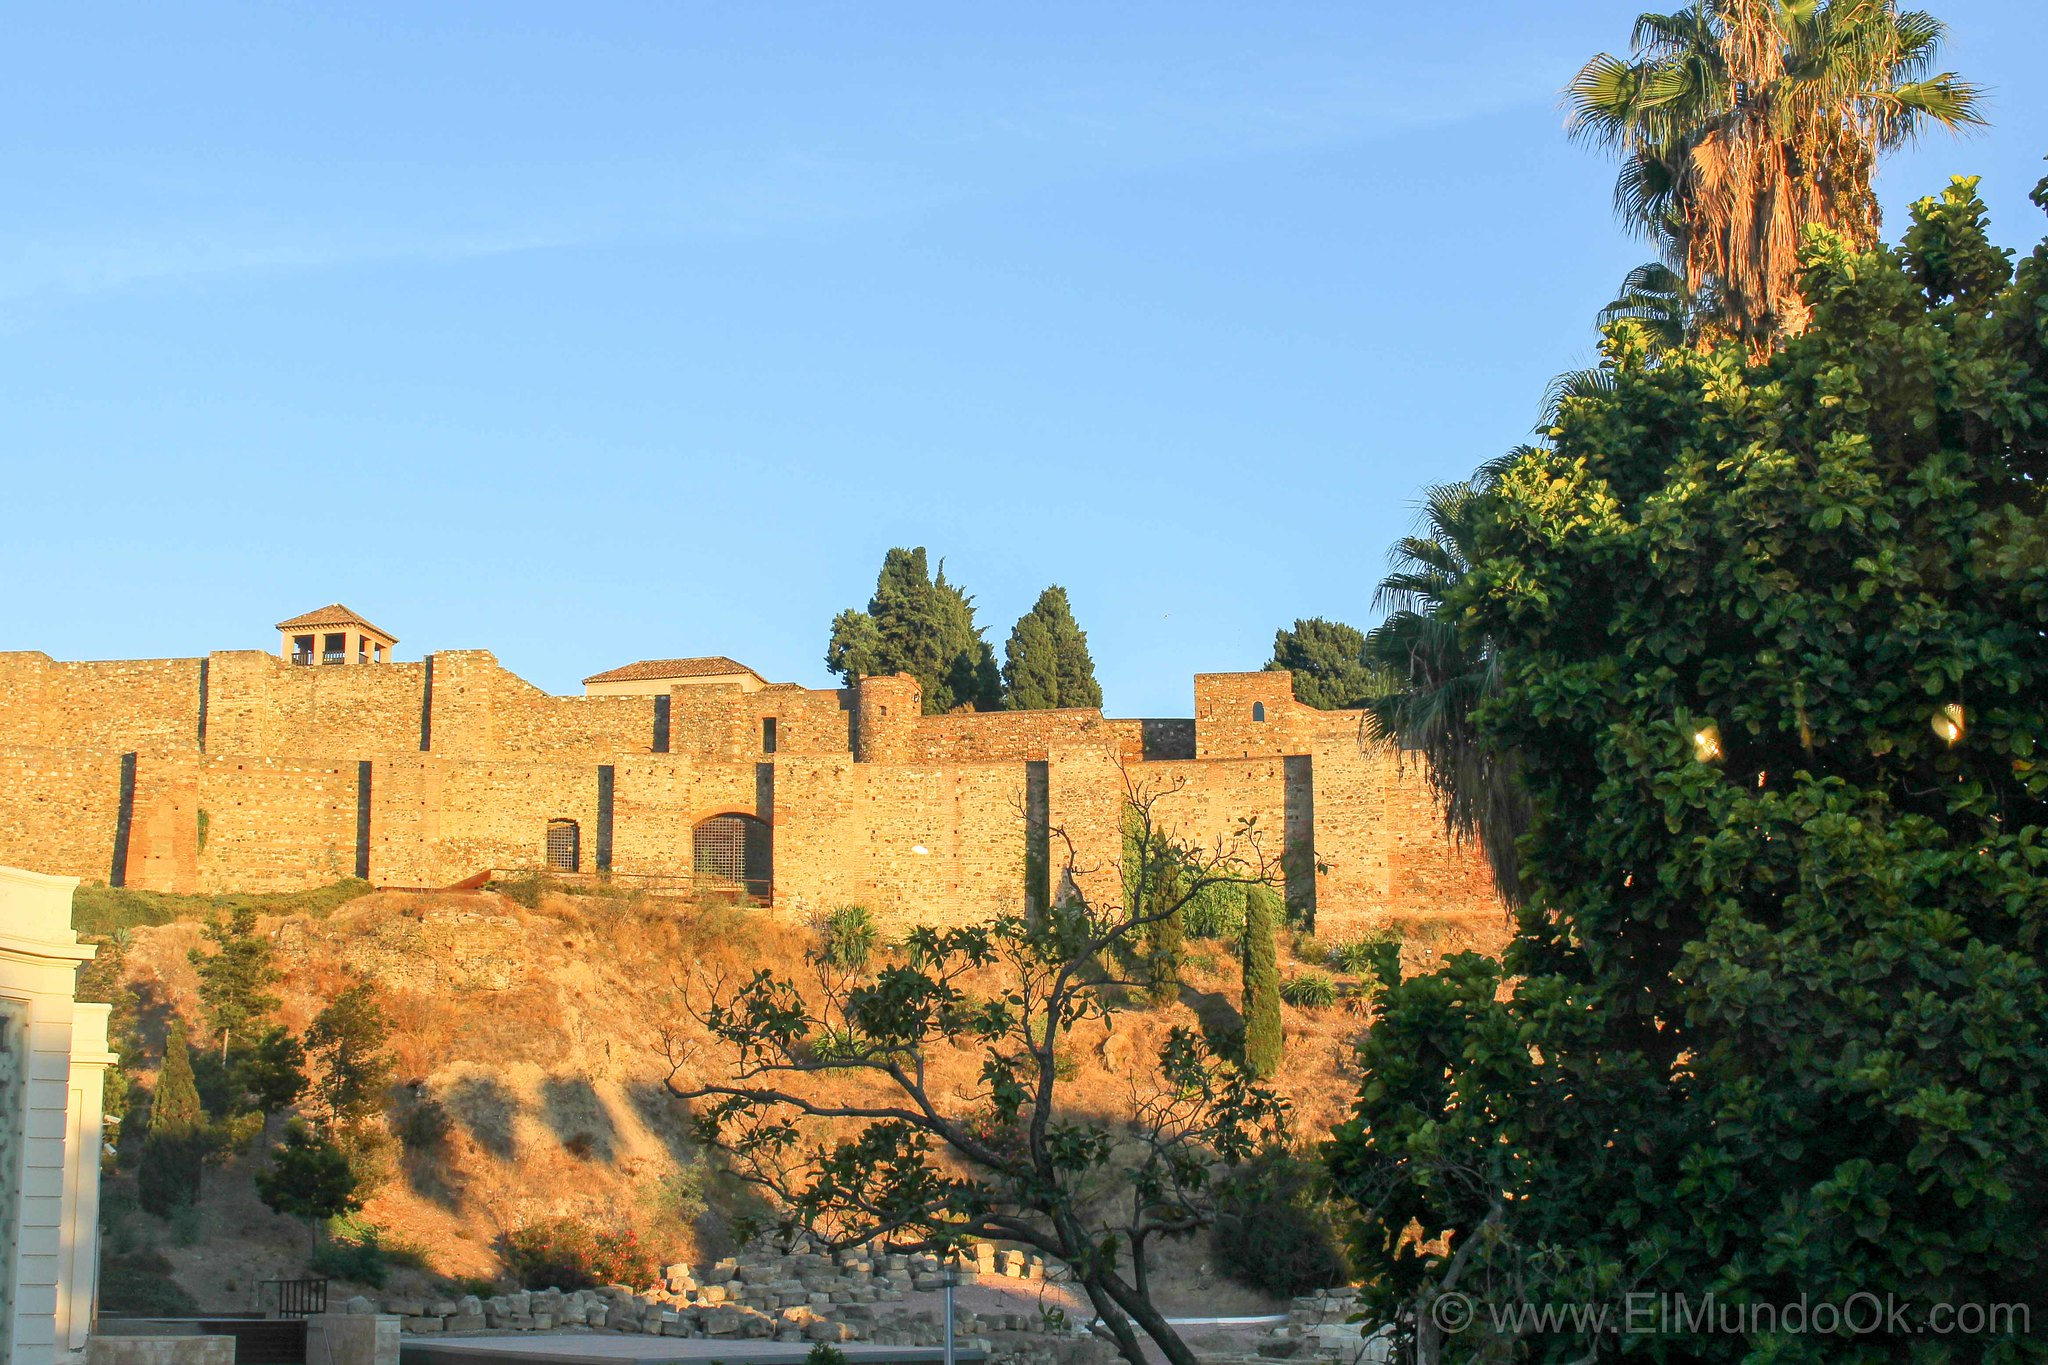 Vista de la Alcazaba Malaga_Elmundook